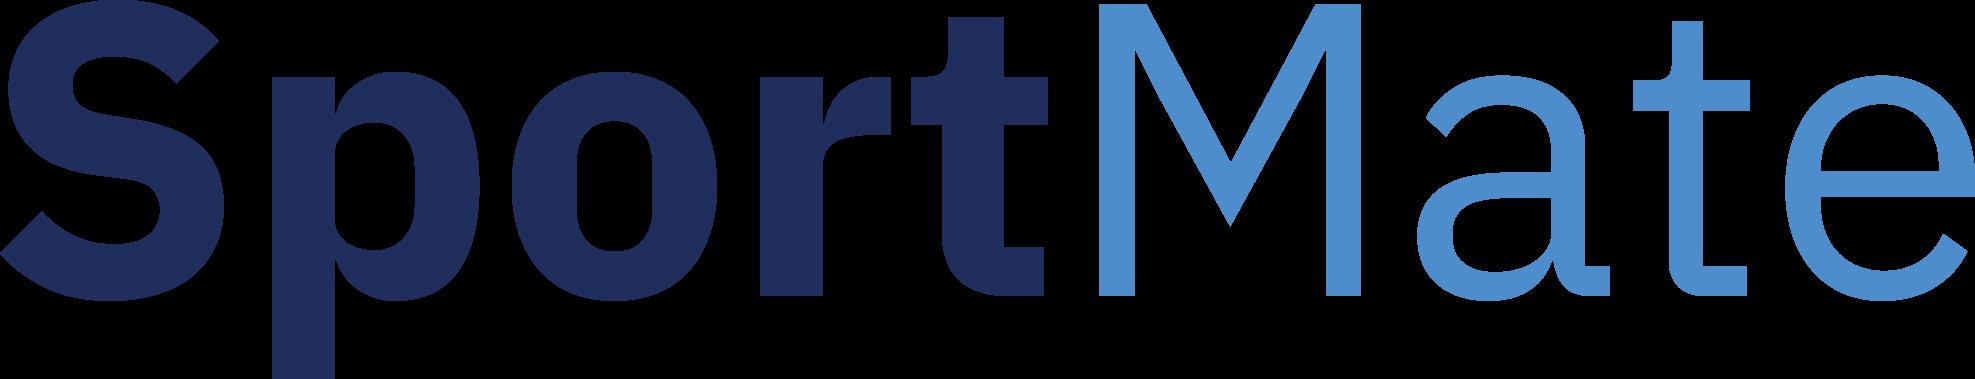 sportmate_logo